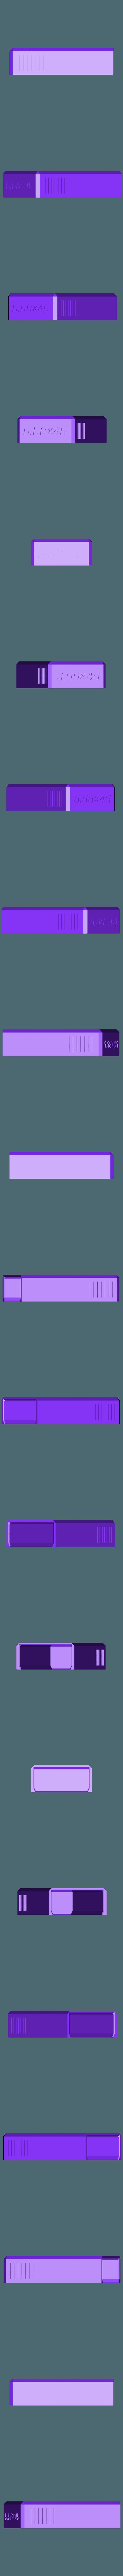 BATTLEBOX-top_5.56.stl Download free STL file BATTLEBOX 5.56 NATO • 3D printable template, EvolvingExtrusions